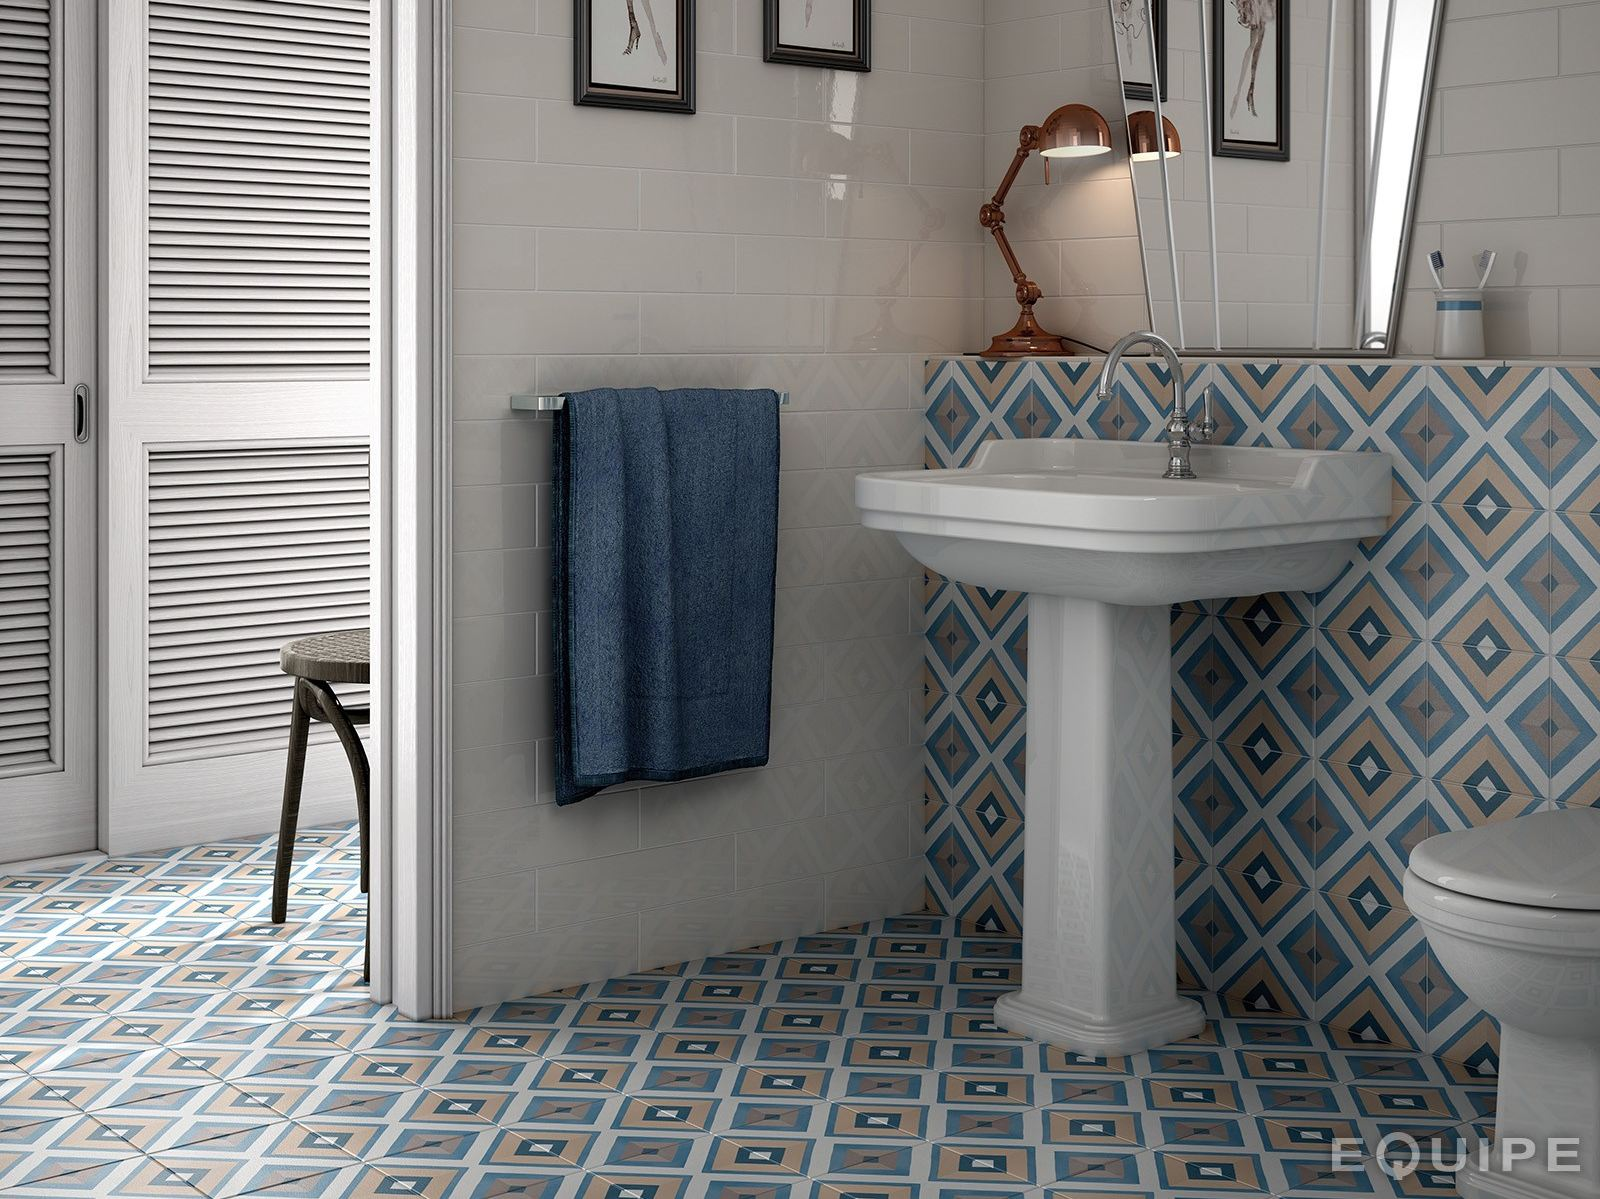 pavimento rivestimento in ceramica caprice deco by equipe ceramicas. Black Bedroom Furniture Sets. Home Design Ideas